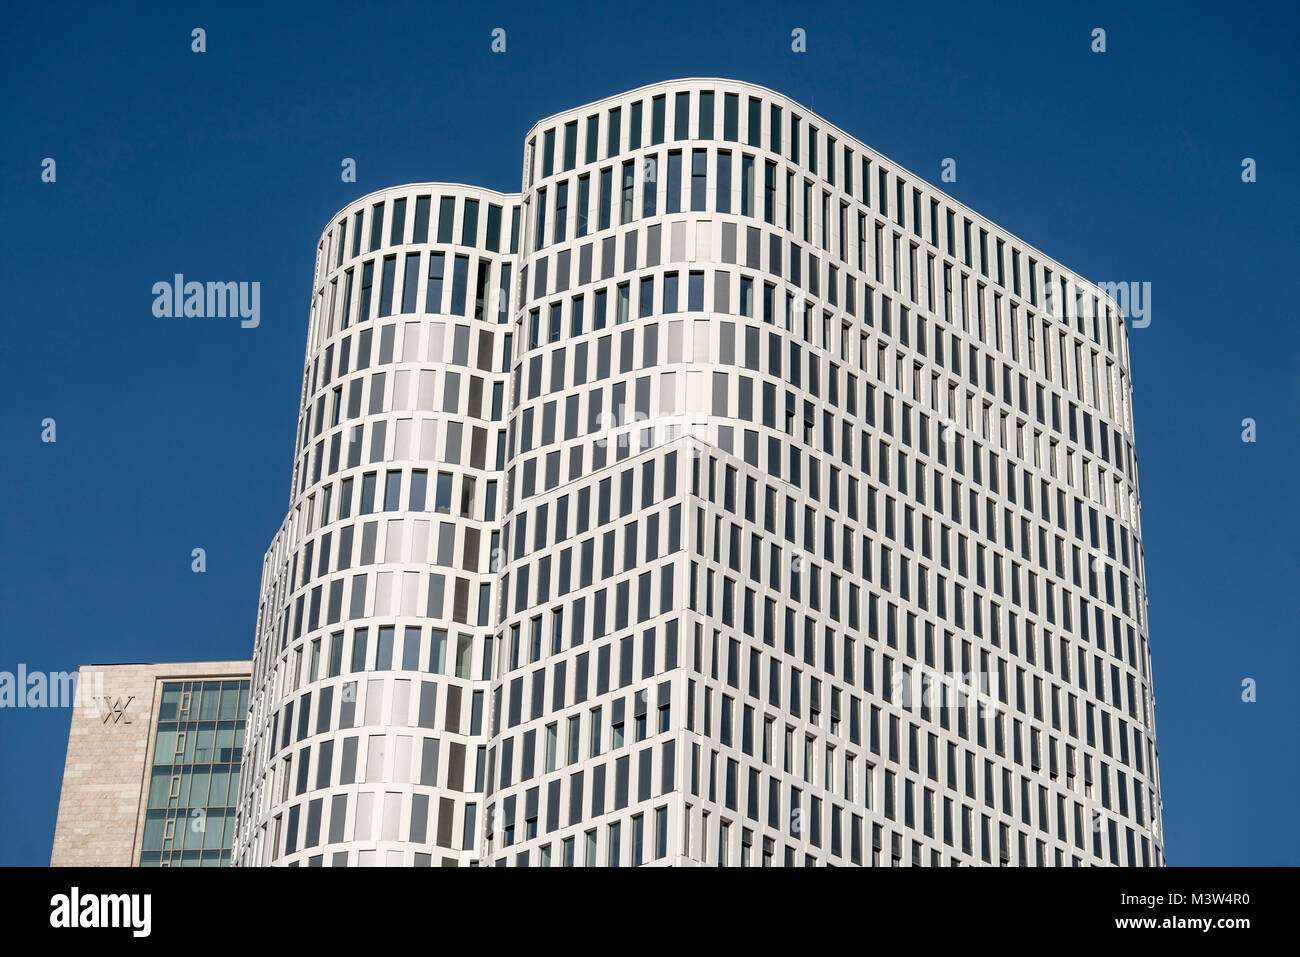 Upper West Zoofenster, Atlas tower, Breitscheidplatz, City West, Berlin, Germany - Stock Image